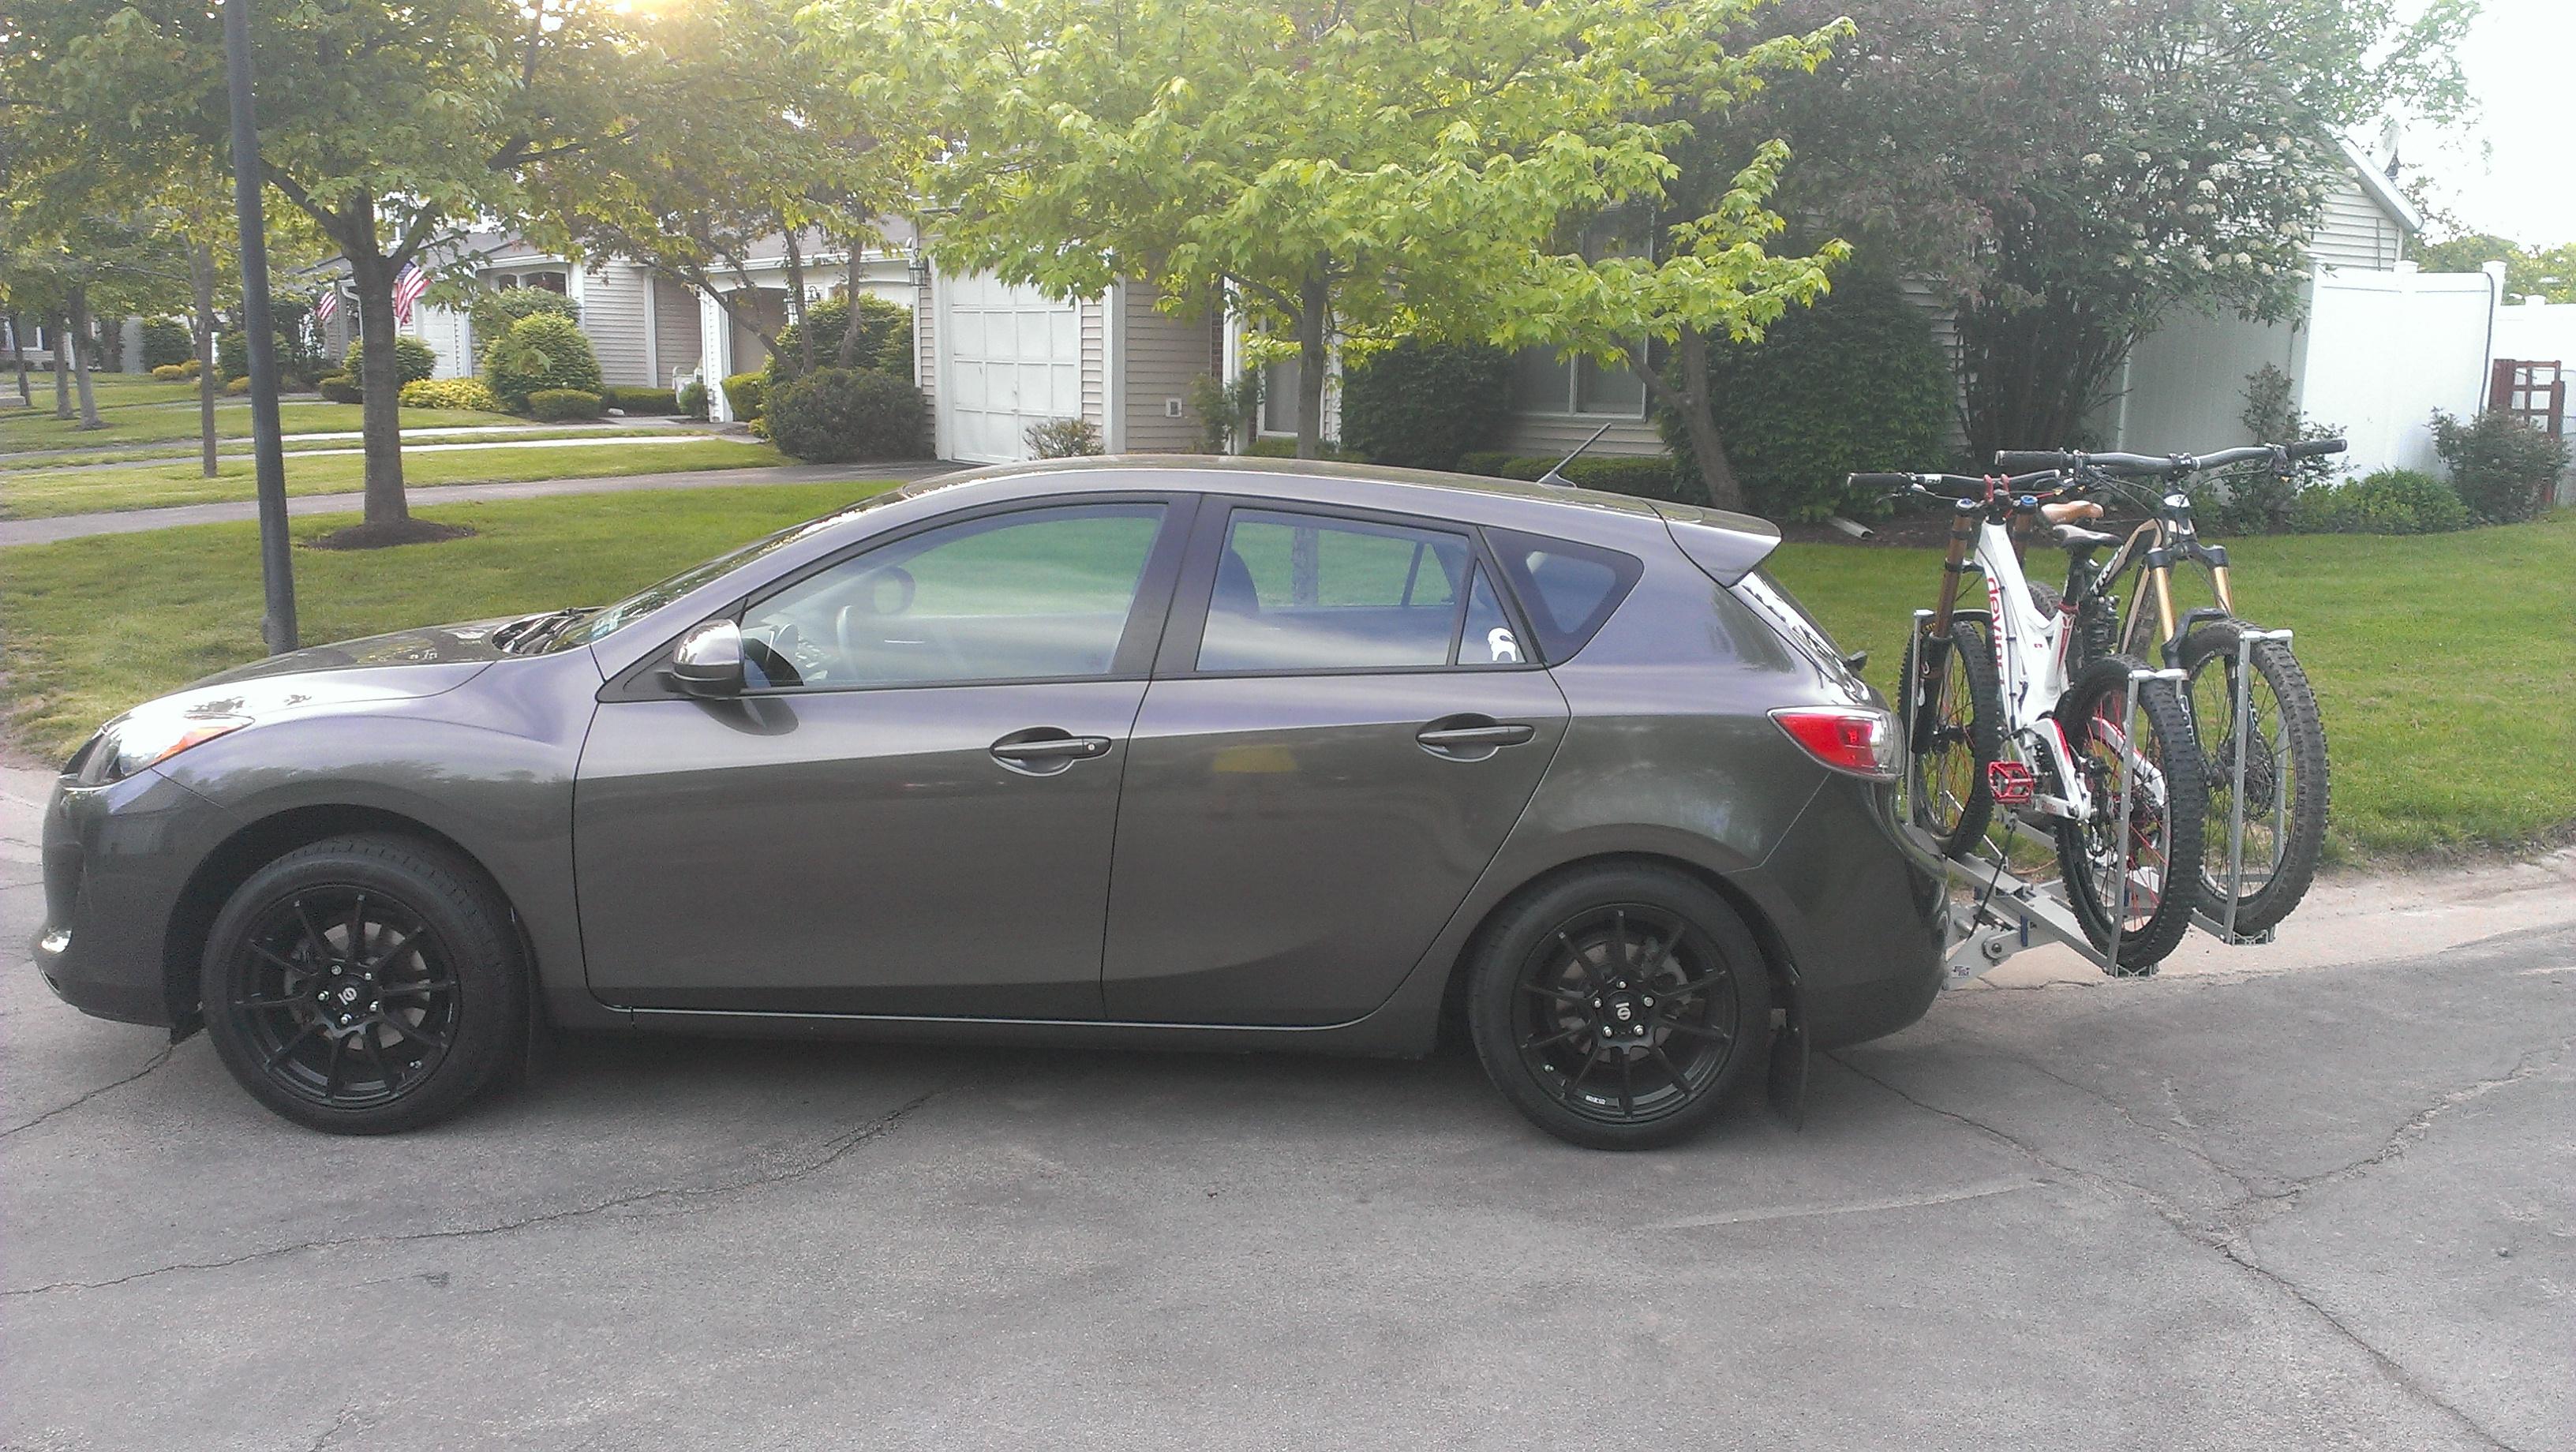 Mazda 3 Hatch With Bike Rack Stiffer Springs 2004 To 2016